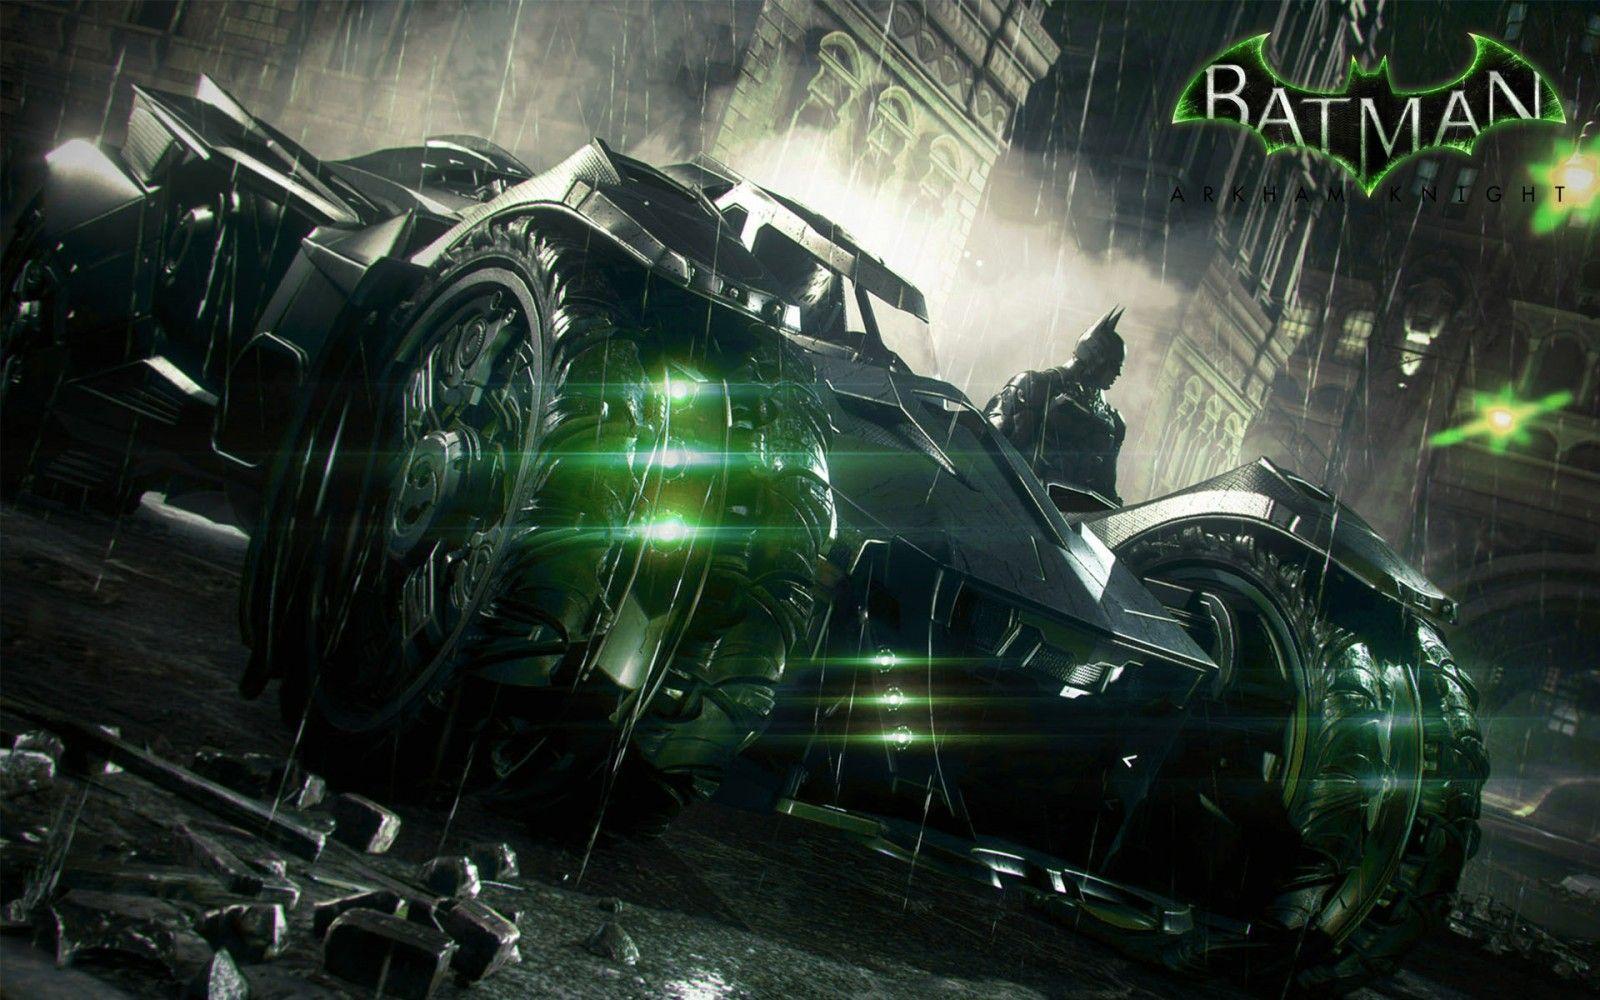 Dark Knight Batmobile Wallpaper Desktop Background Df4 Movie